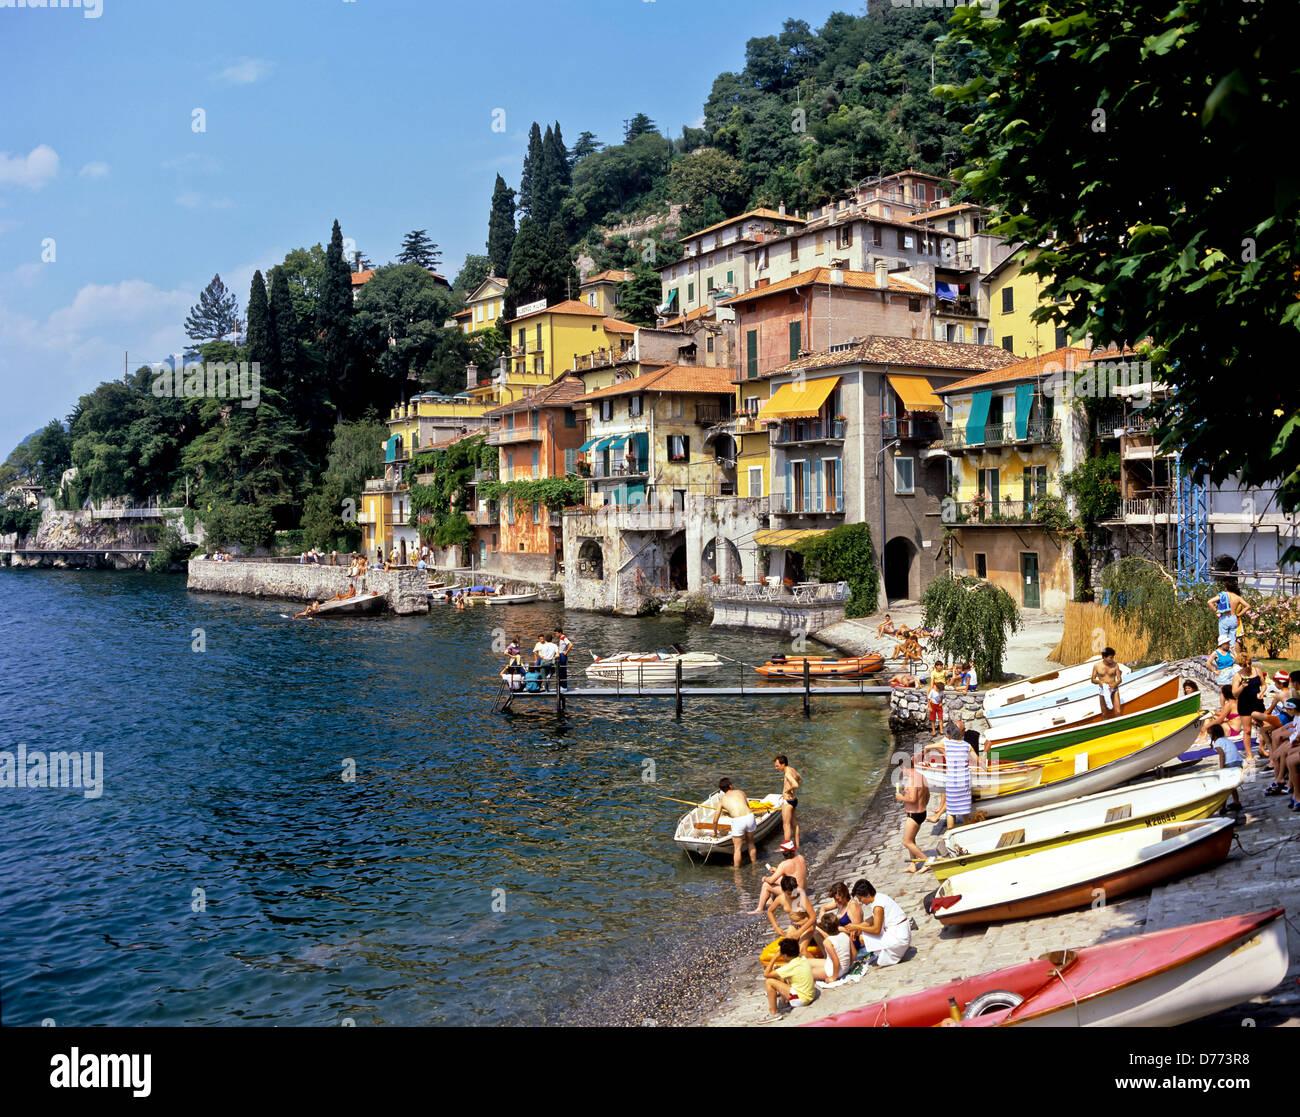 8706. Varenna, Lake Como, Italy, Europe - Stock Image